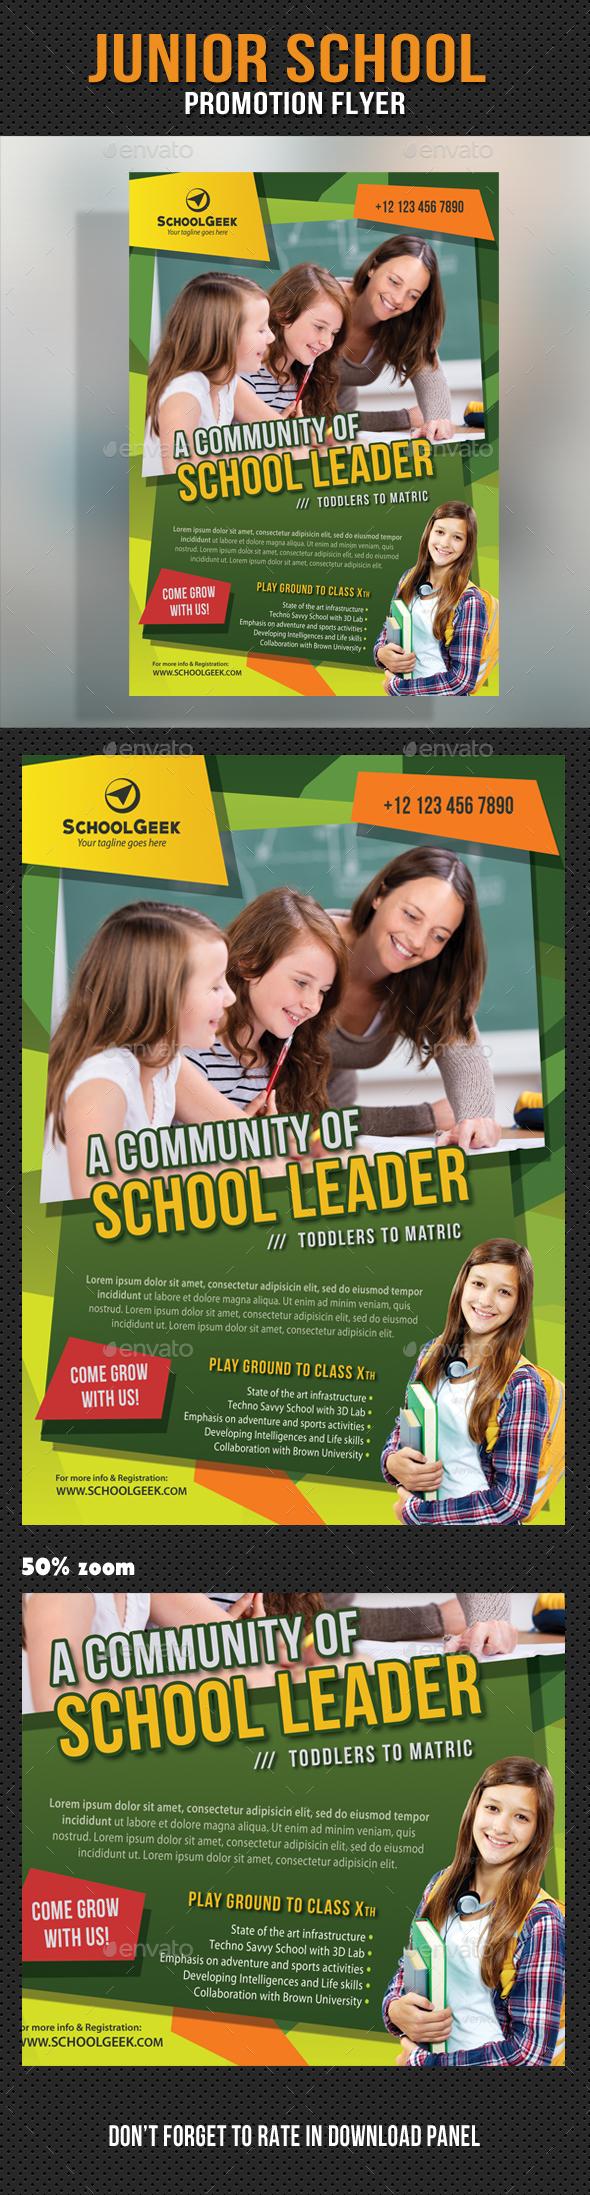 Junior School Promotion Flyer 12 - Events Flyers